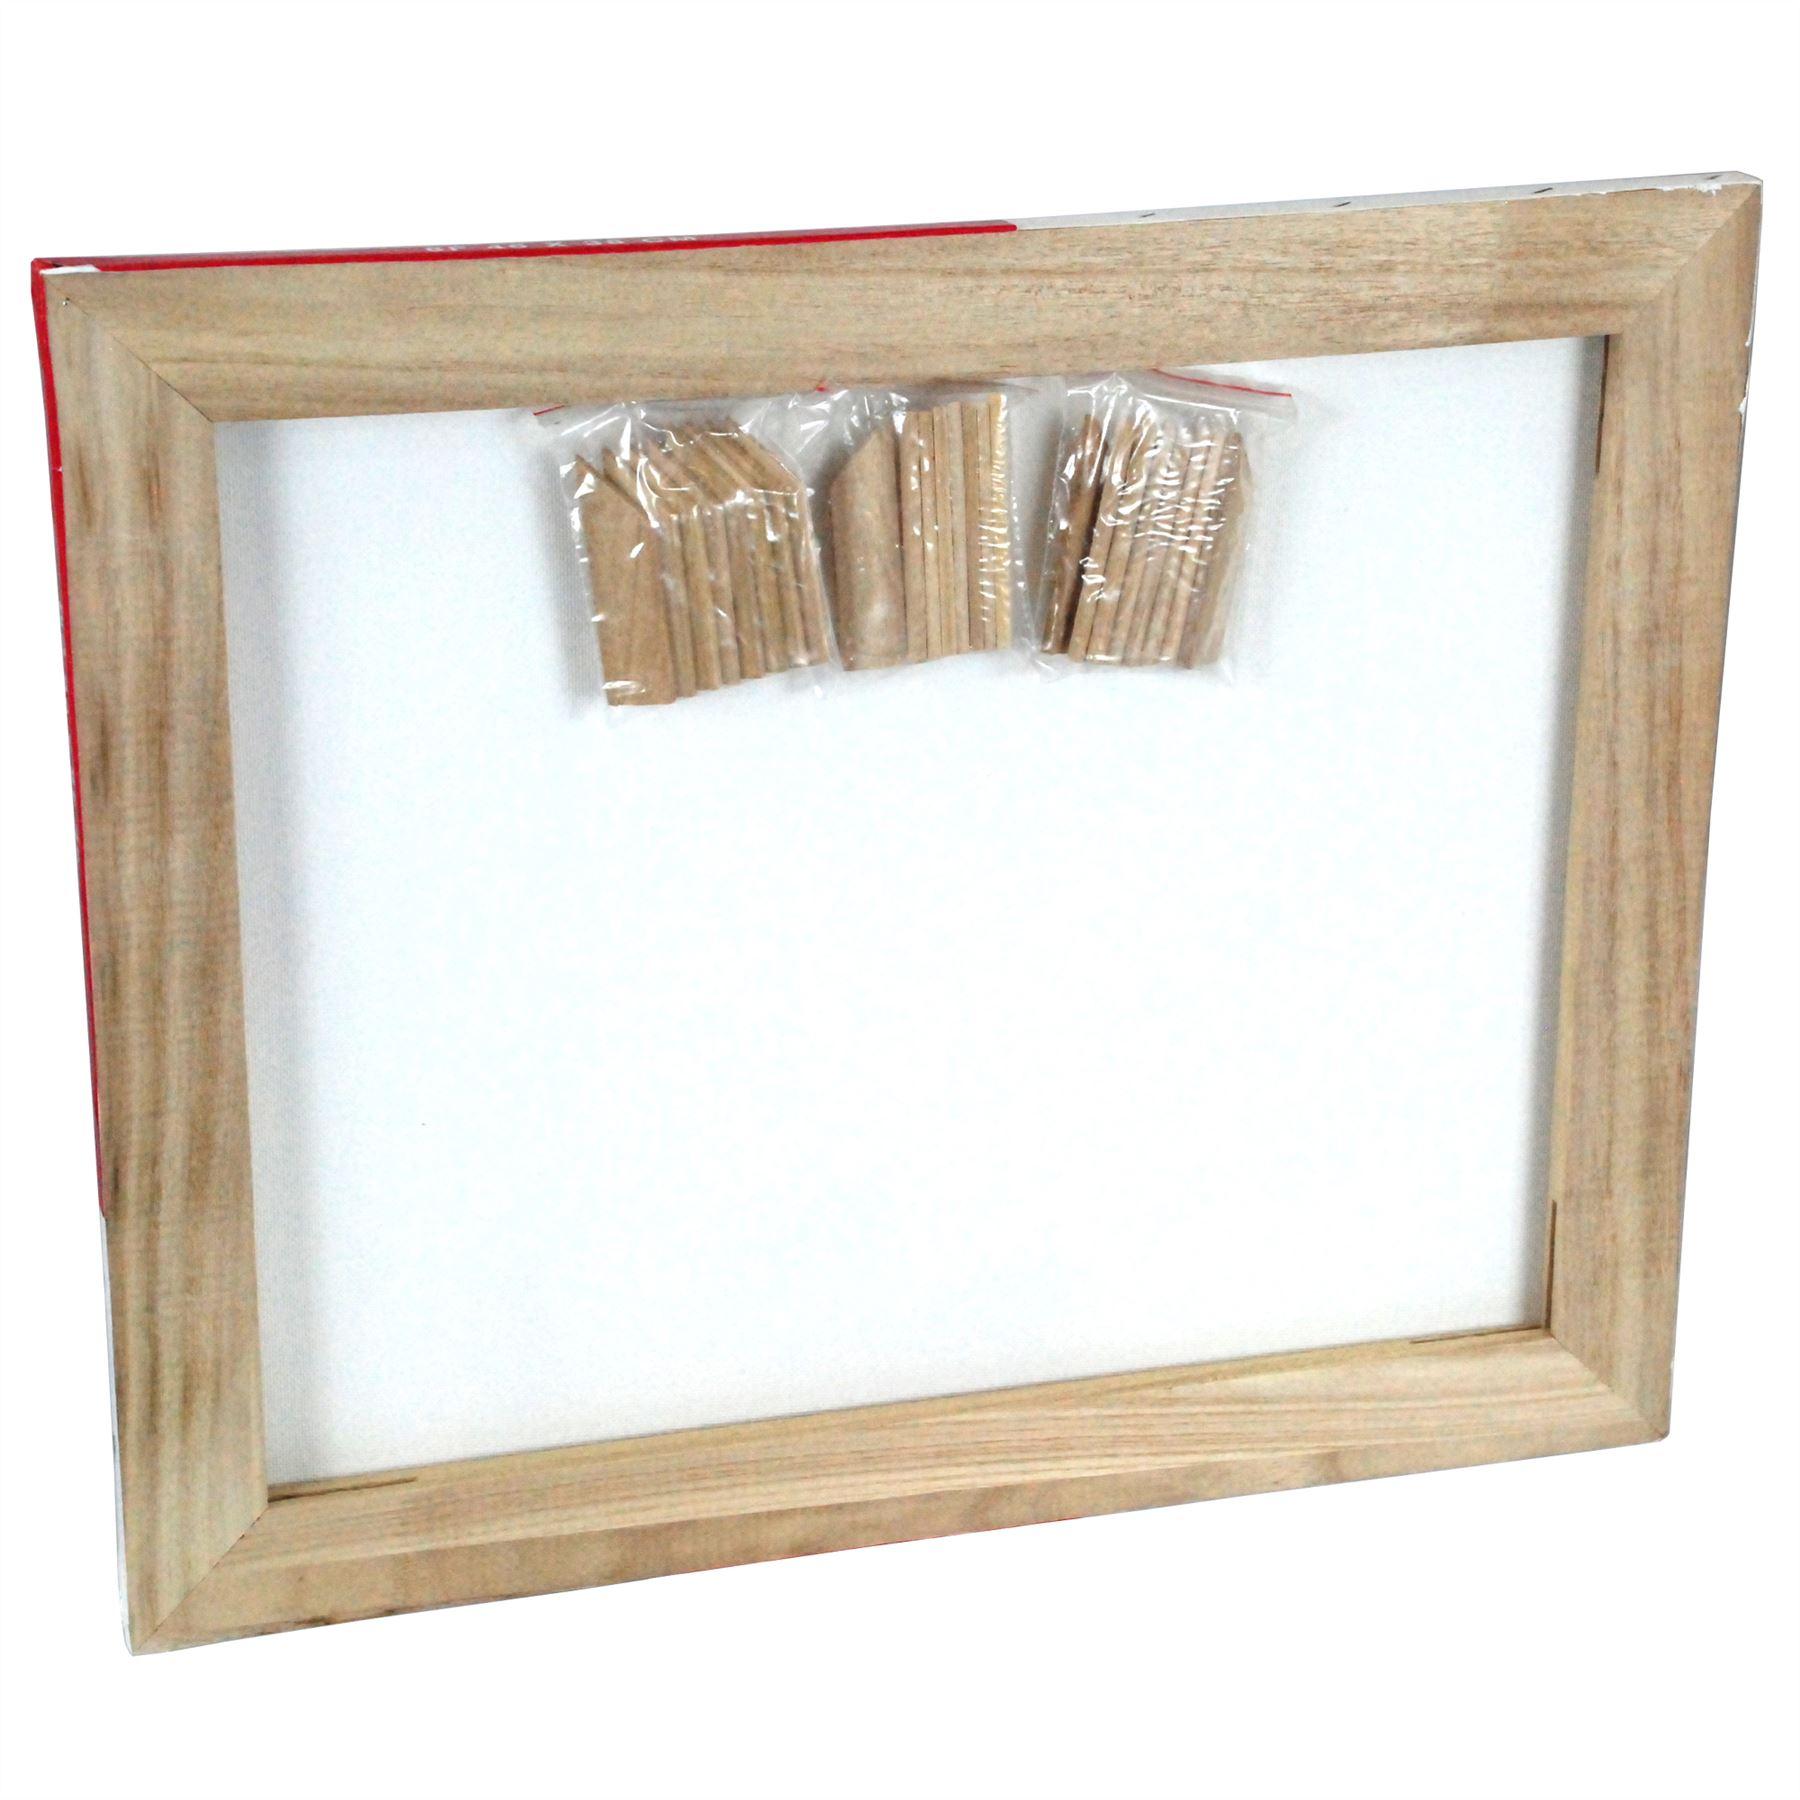 3PC Simpa® Blank Framed Stretch Canvas Set Framed Blank Cotton Canvas